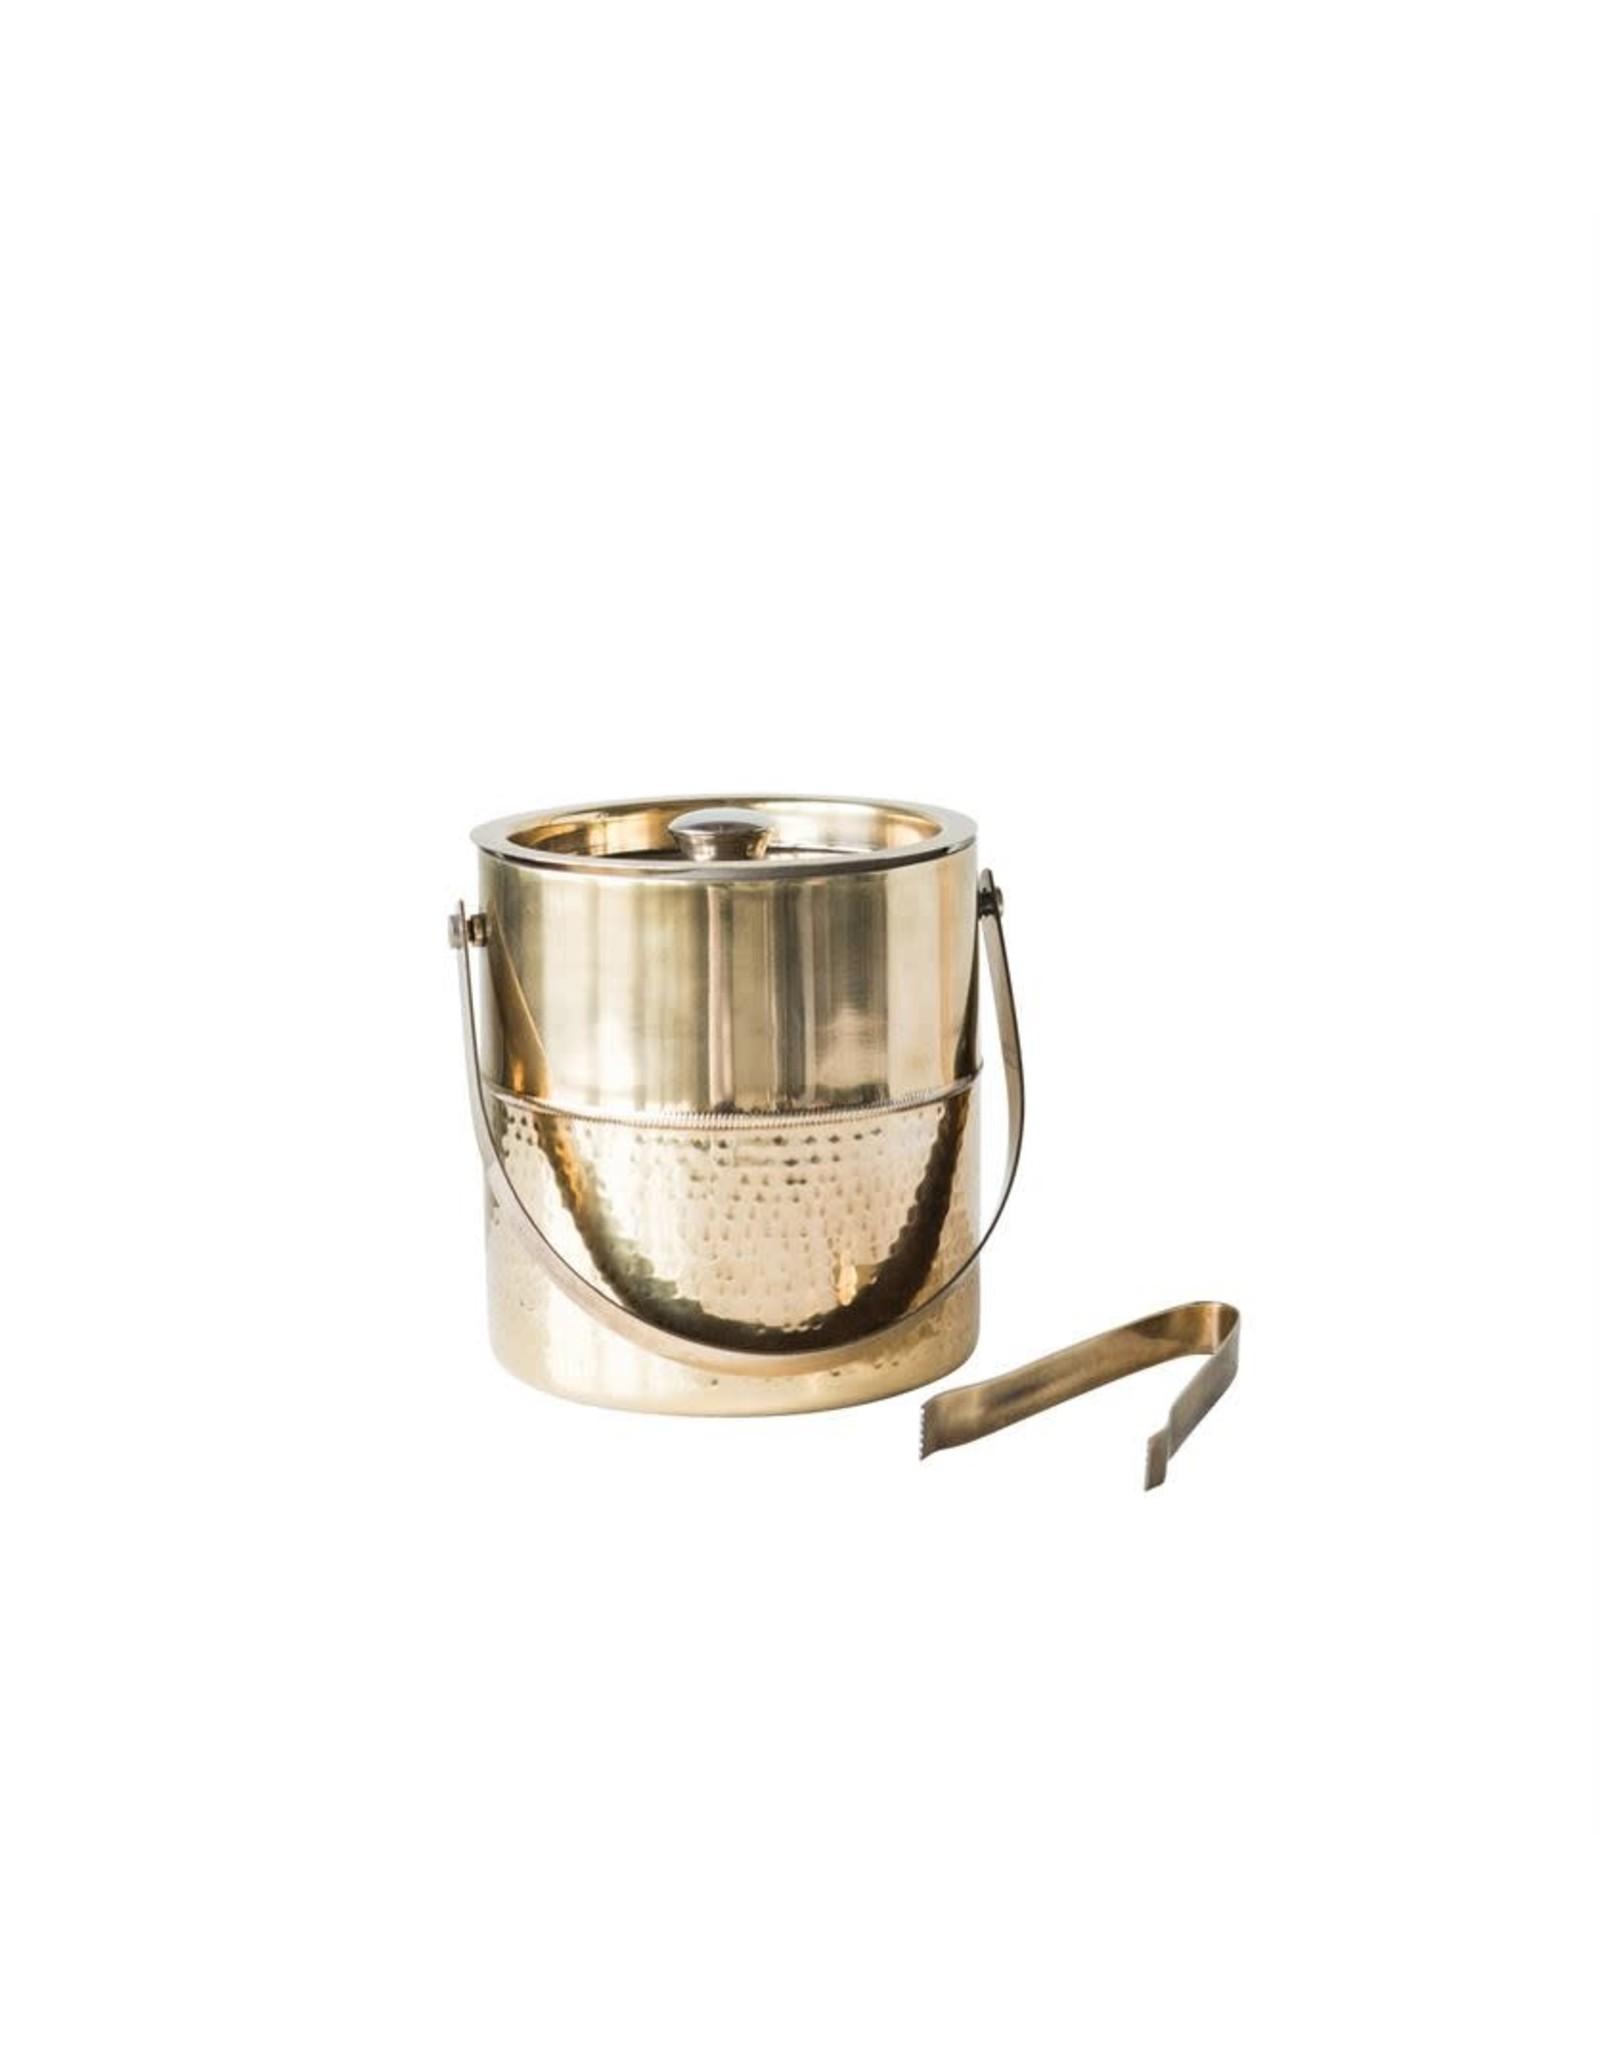 Website Stainless Steel Ice Bucket w/ Tongs, Brass Finish